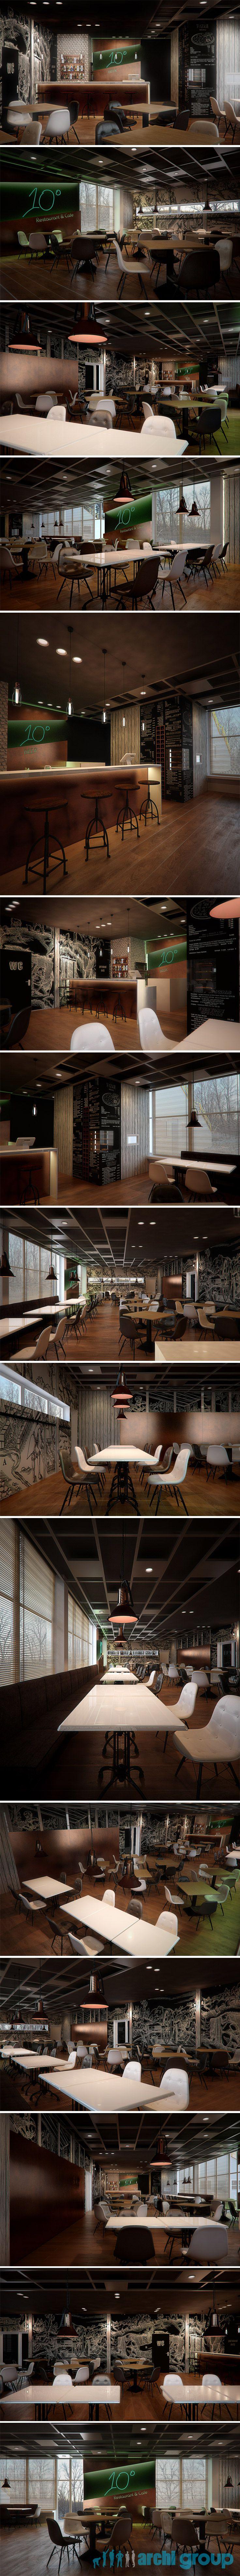 Restaurant design in Tarnowskie Gory POLAND - archi group. Restauracja w Tarnowskich Górach.